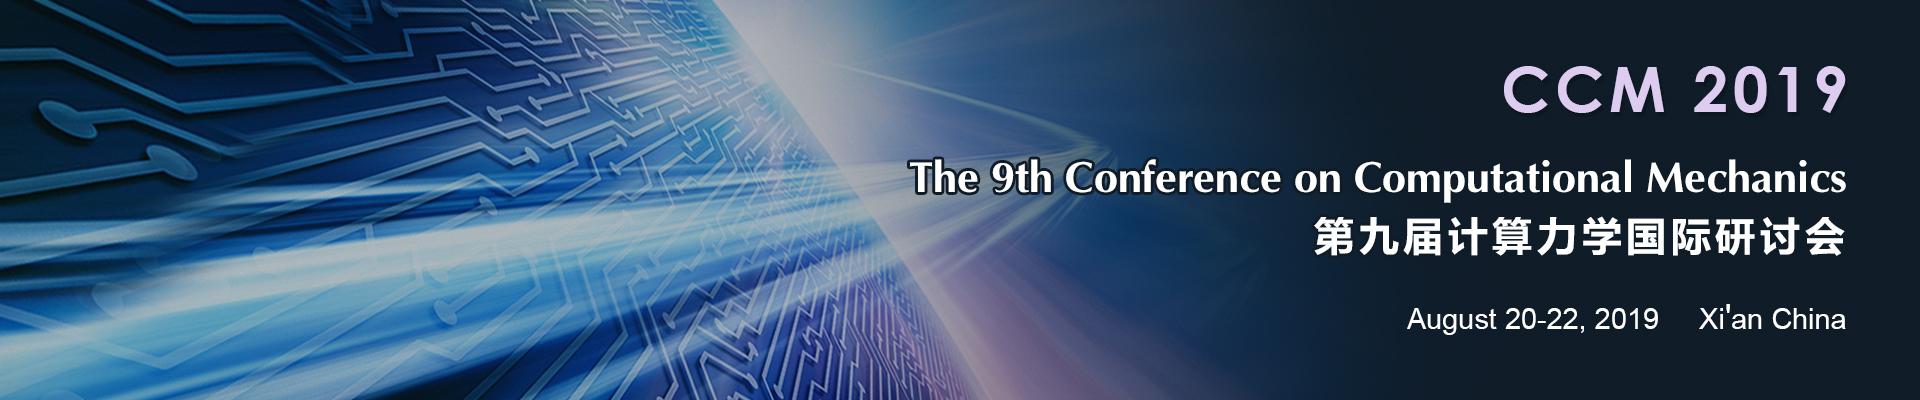 The 9th Conference on Computational Mechanics (CCM 2019), 2019年第九